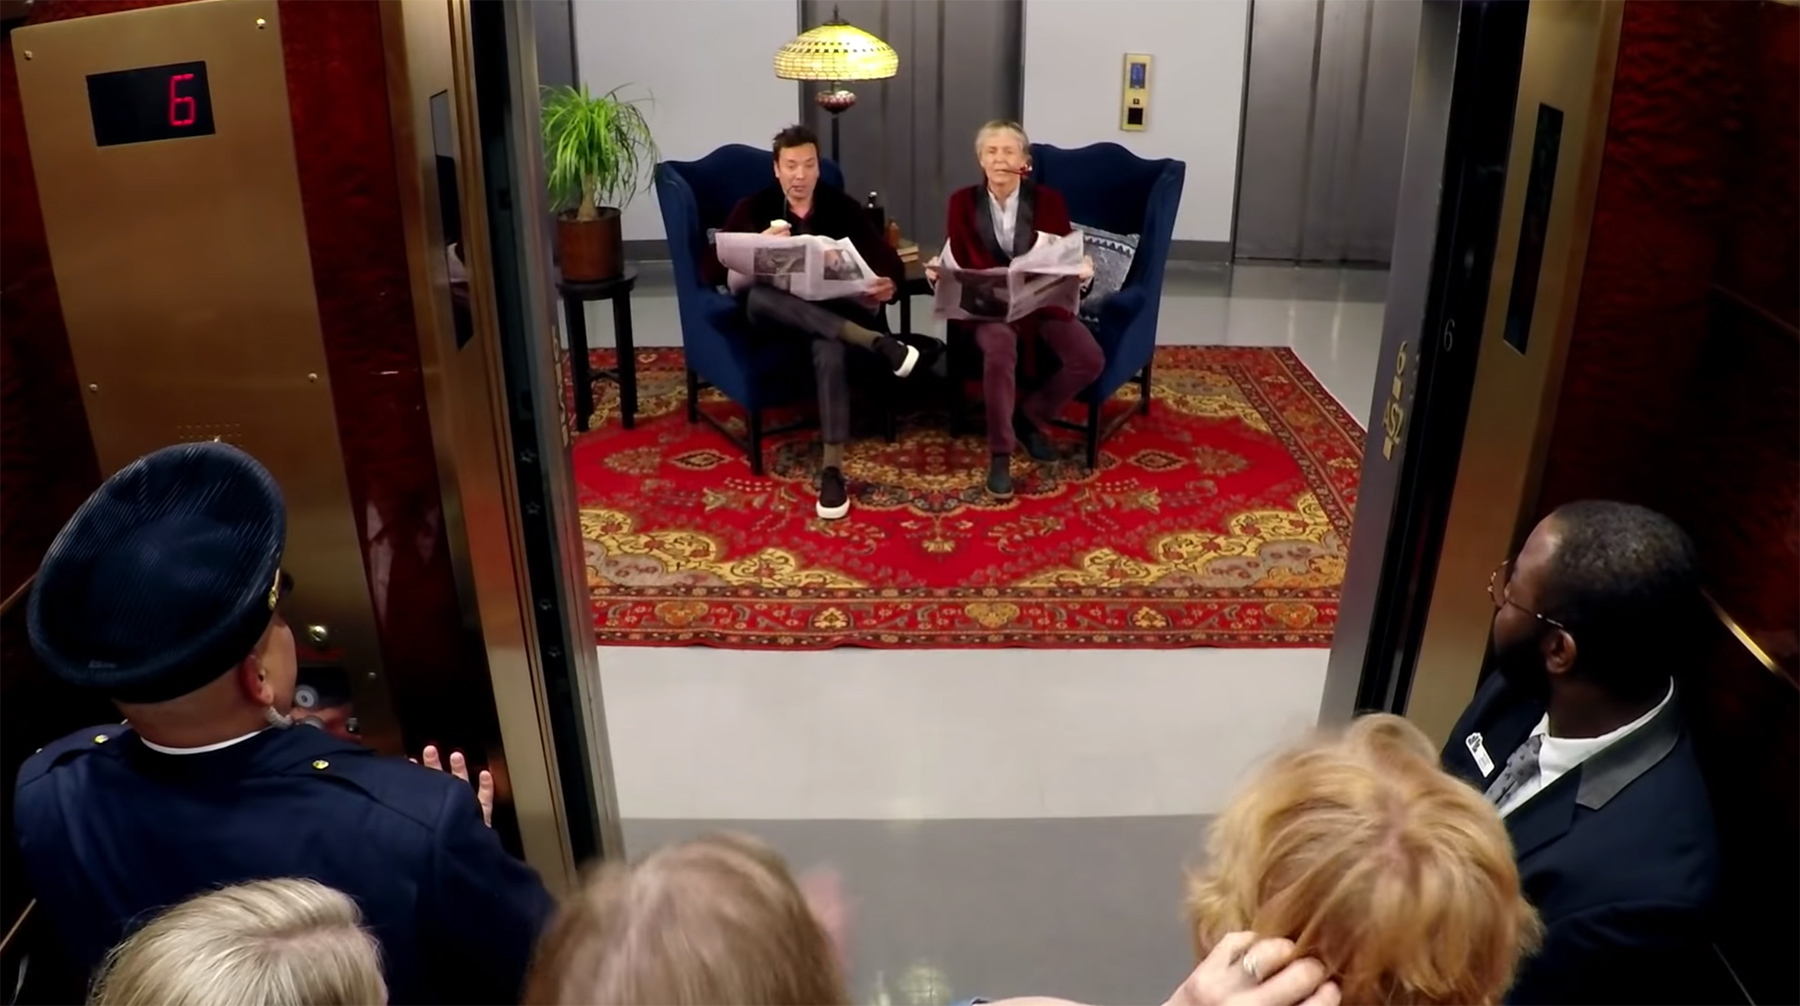 Jimmy Fallon und Paul McCartney überraschen NBC-Besucher jimmy-fallon-paul-mccartney-fahrstuhl-gags